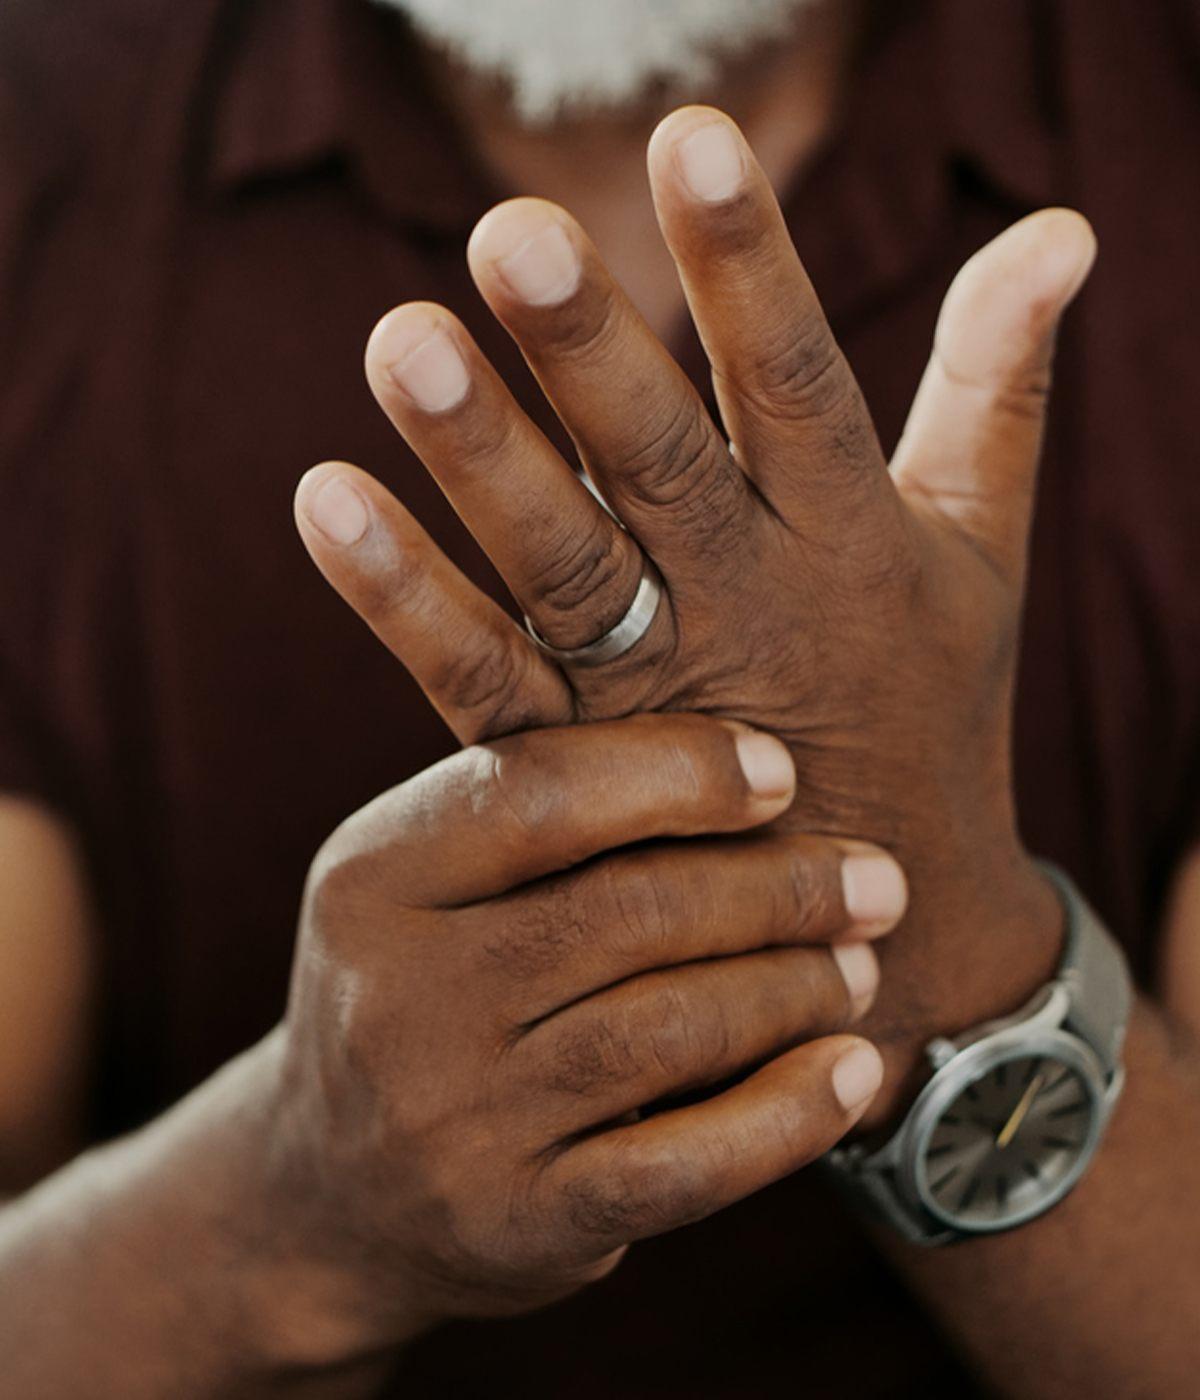 Man holding hand because of pain caused by Rheumatoid Arthritis